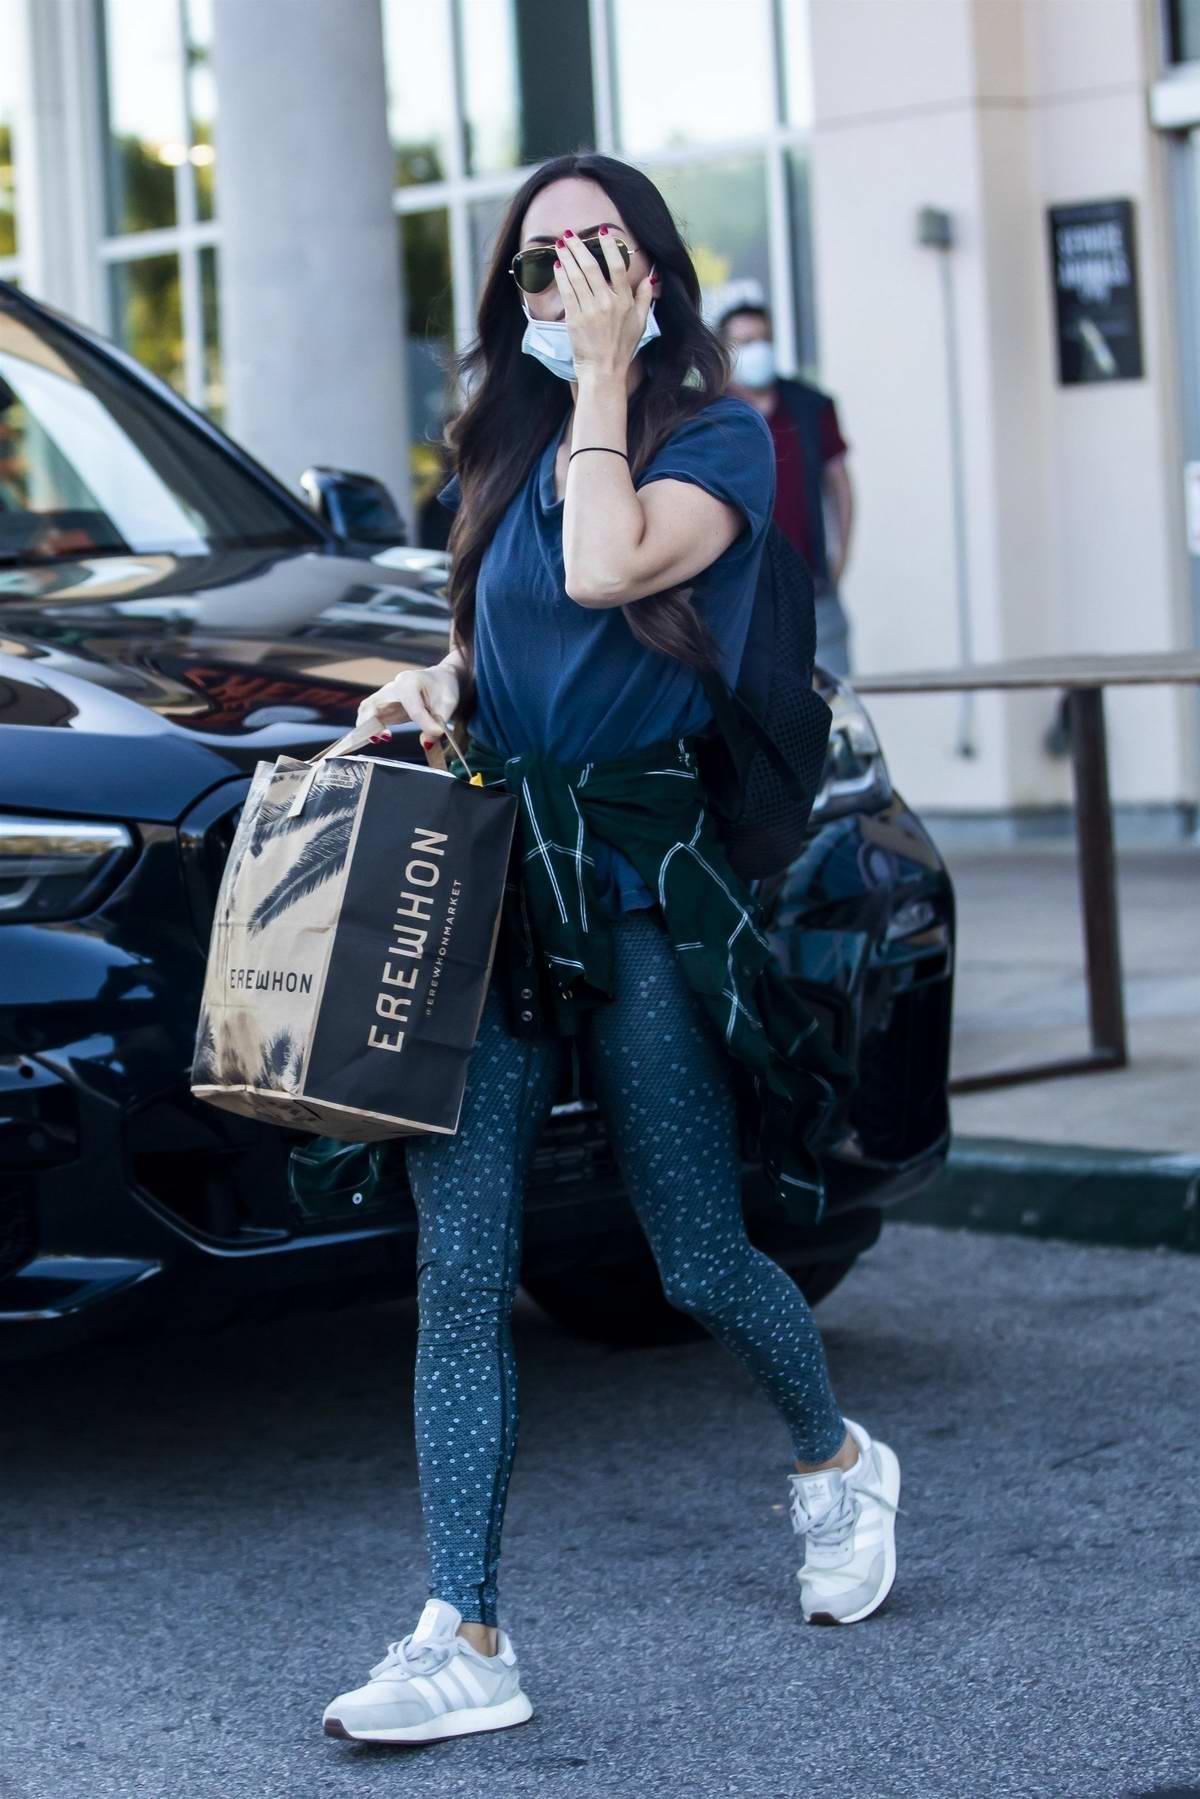 Megan Fox steps out for shopping at Erewhon Organic market in Calabasas, California